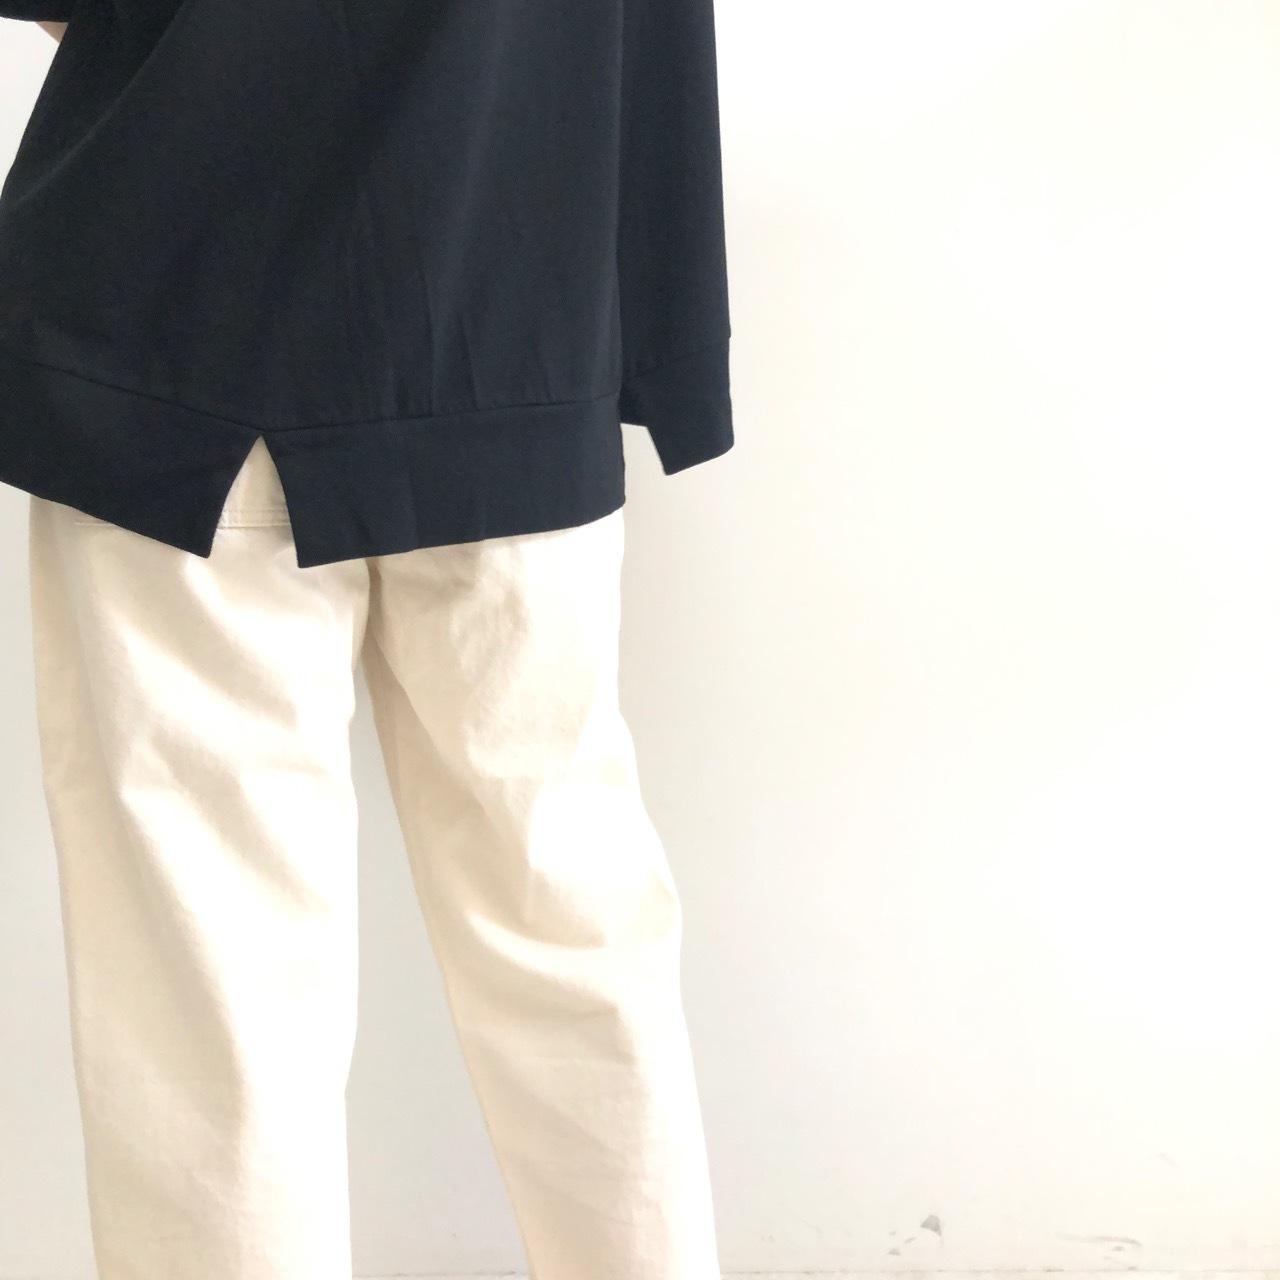 【 siro de labonte 】- R923228 - バックスリットTシャツ